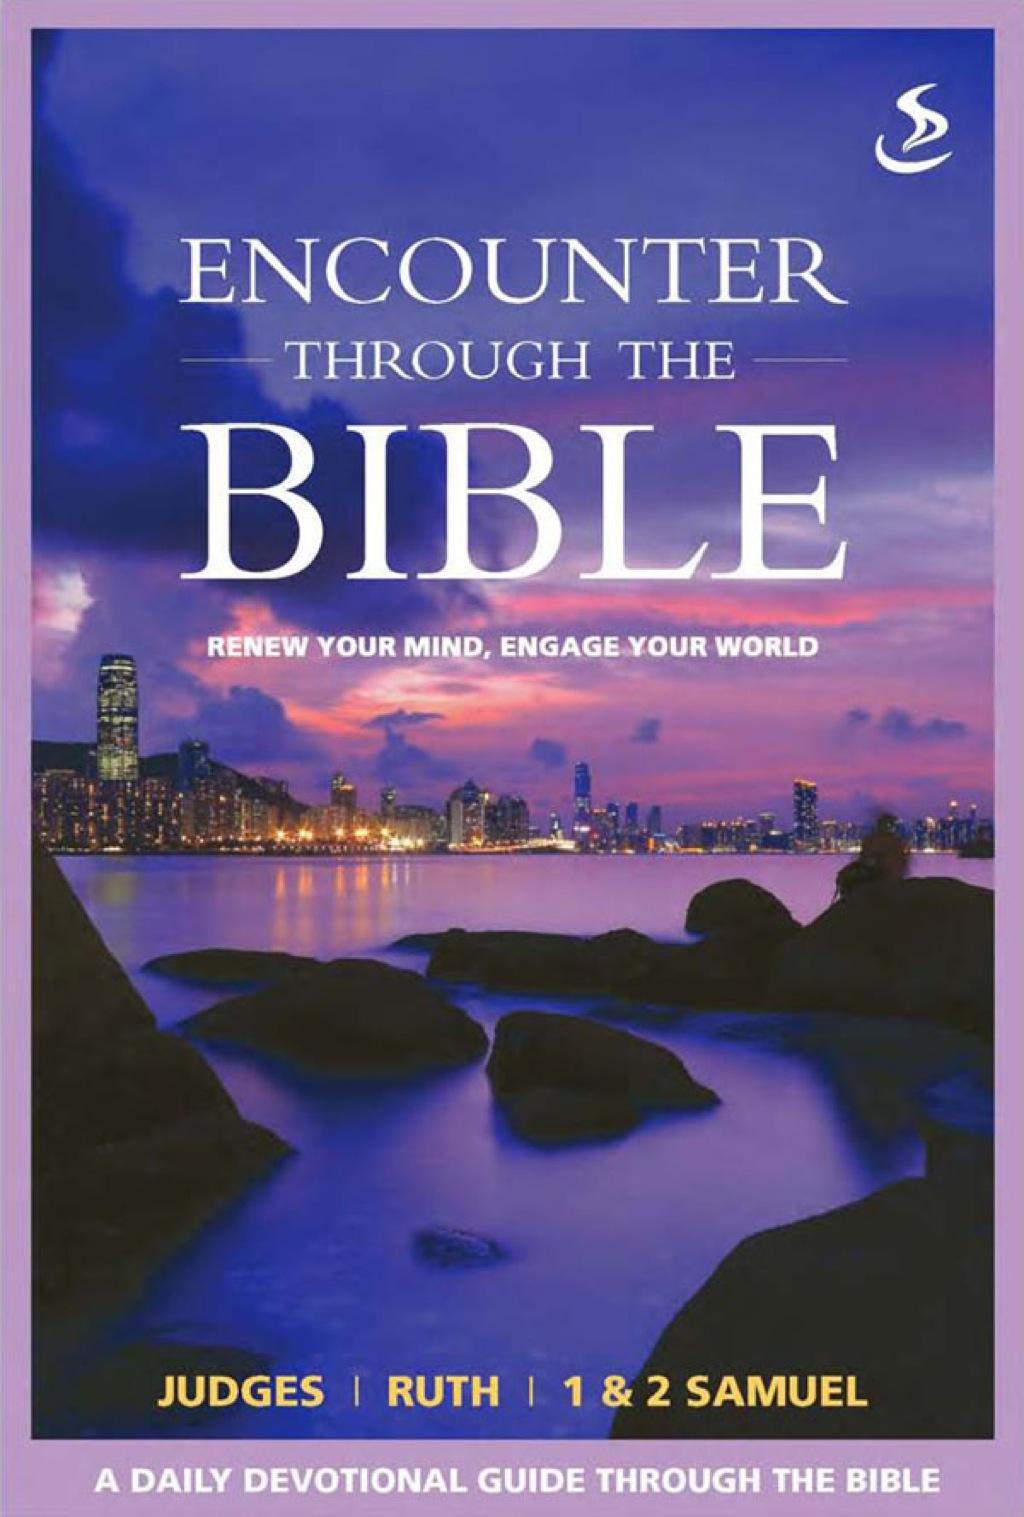 Encounter through the Bible - Judges - Ruth - 1&2 Samuel (eBook)